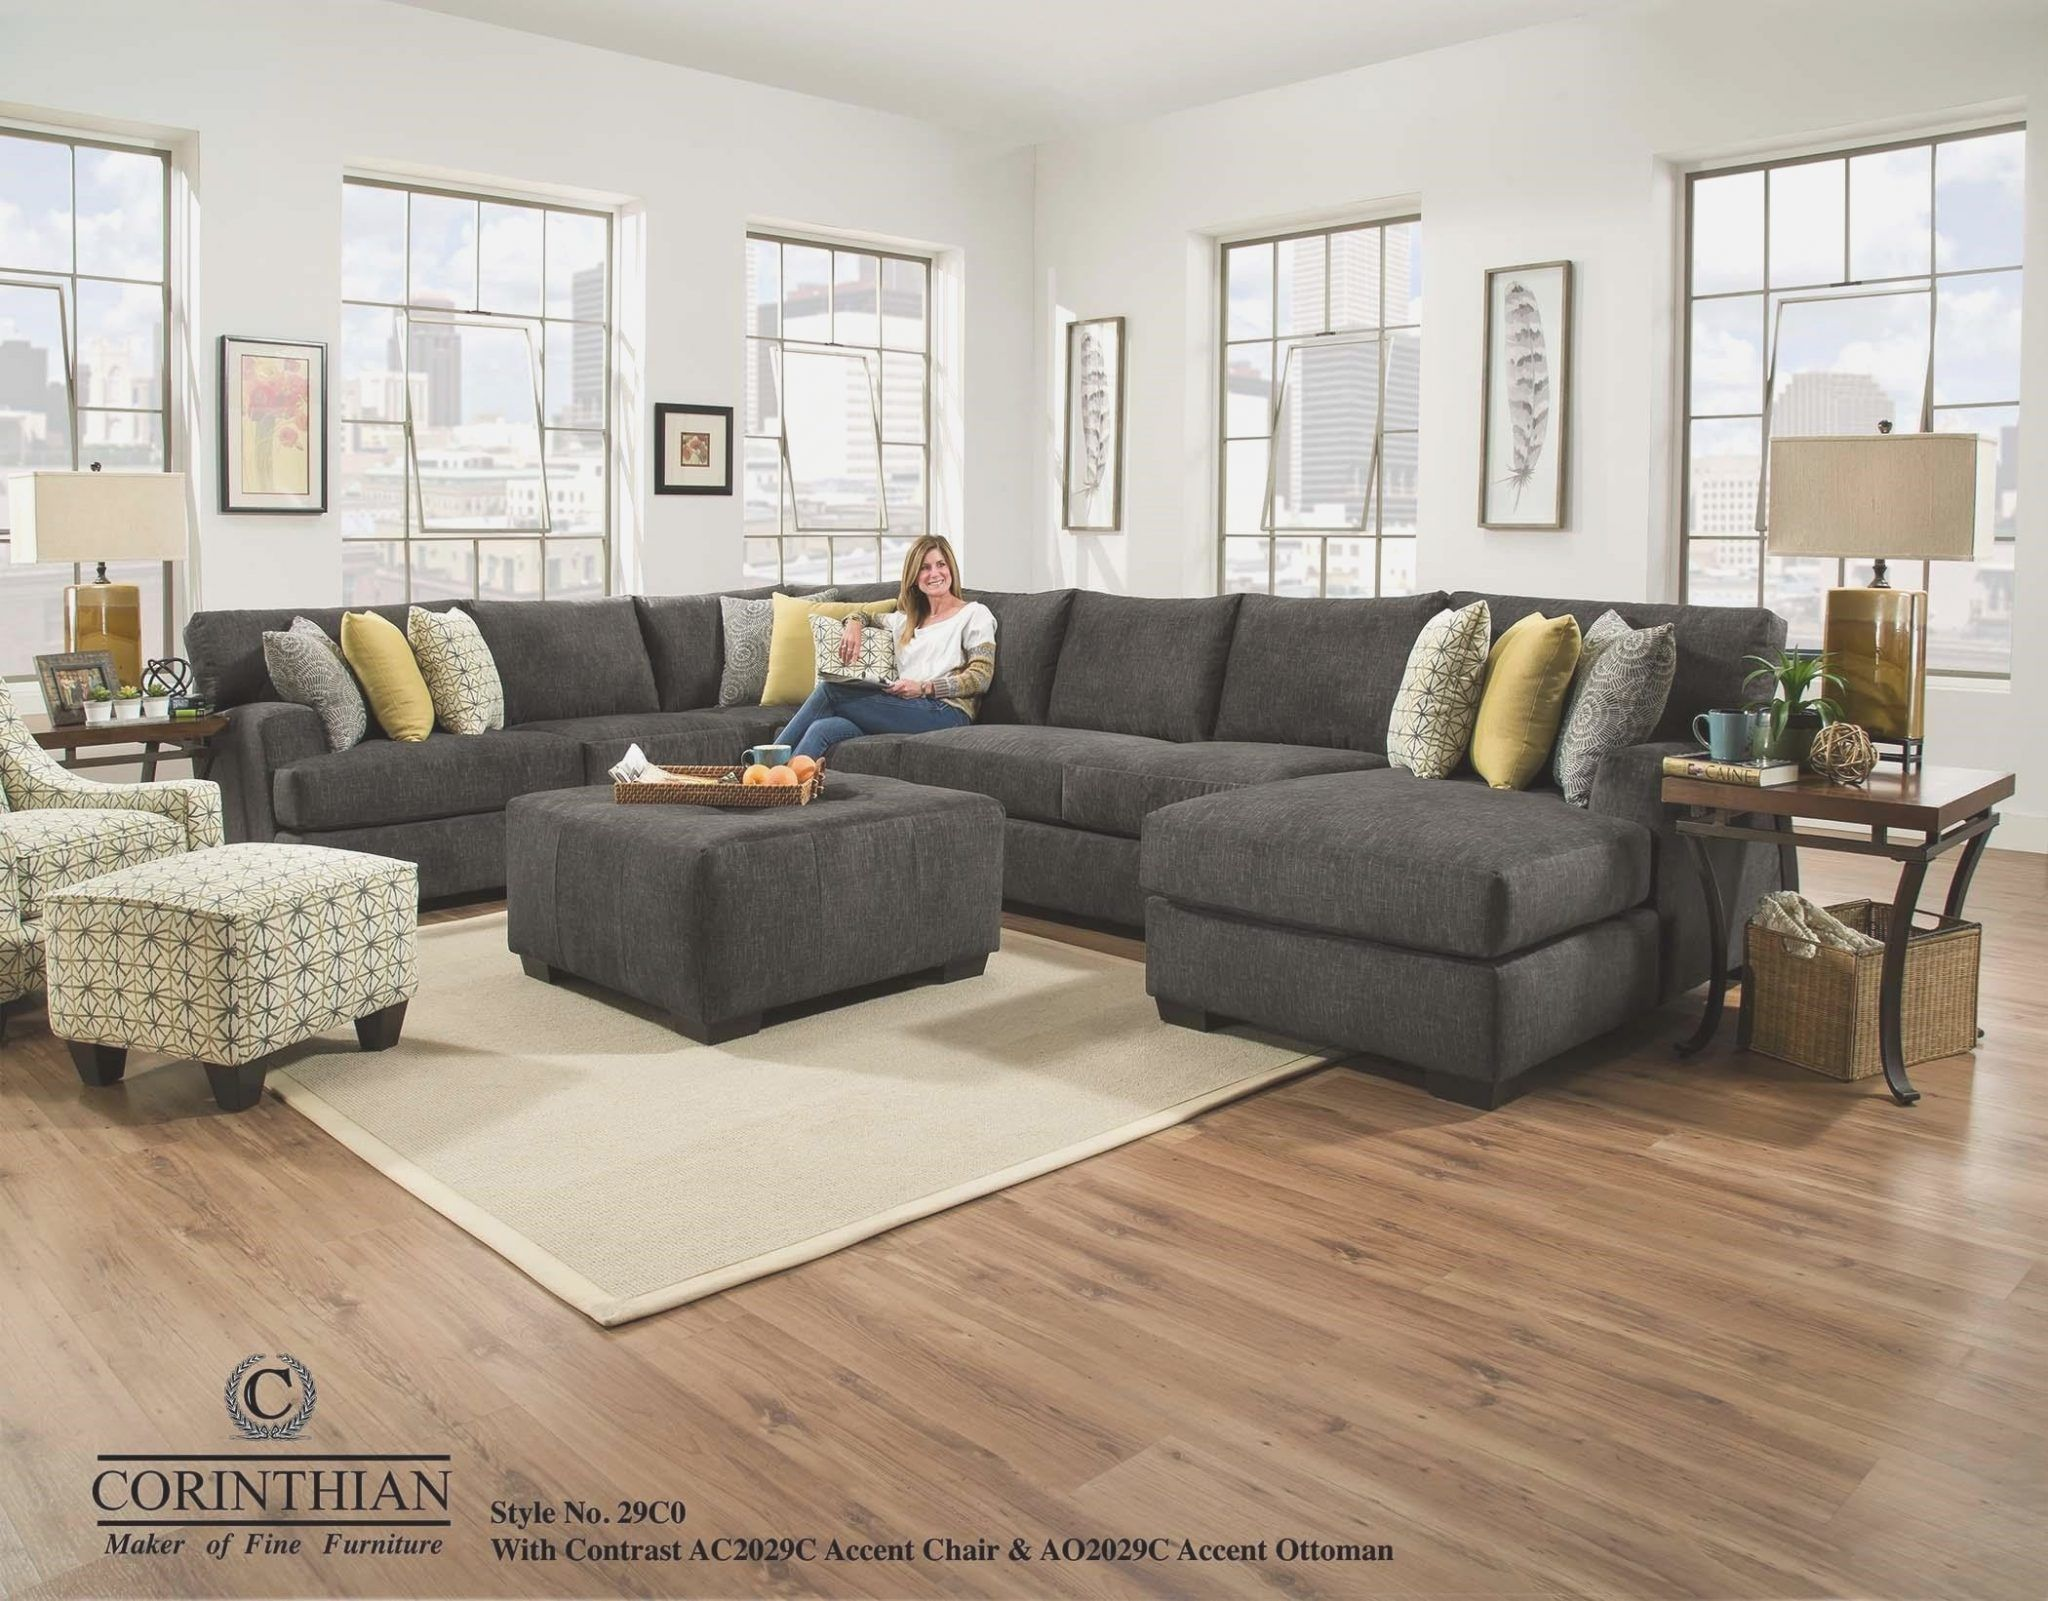 Lazy Boy Sofa Bed Air Mattress Pump Narrow Sofas Toronto Sleepers La Z Furniture Sleeper